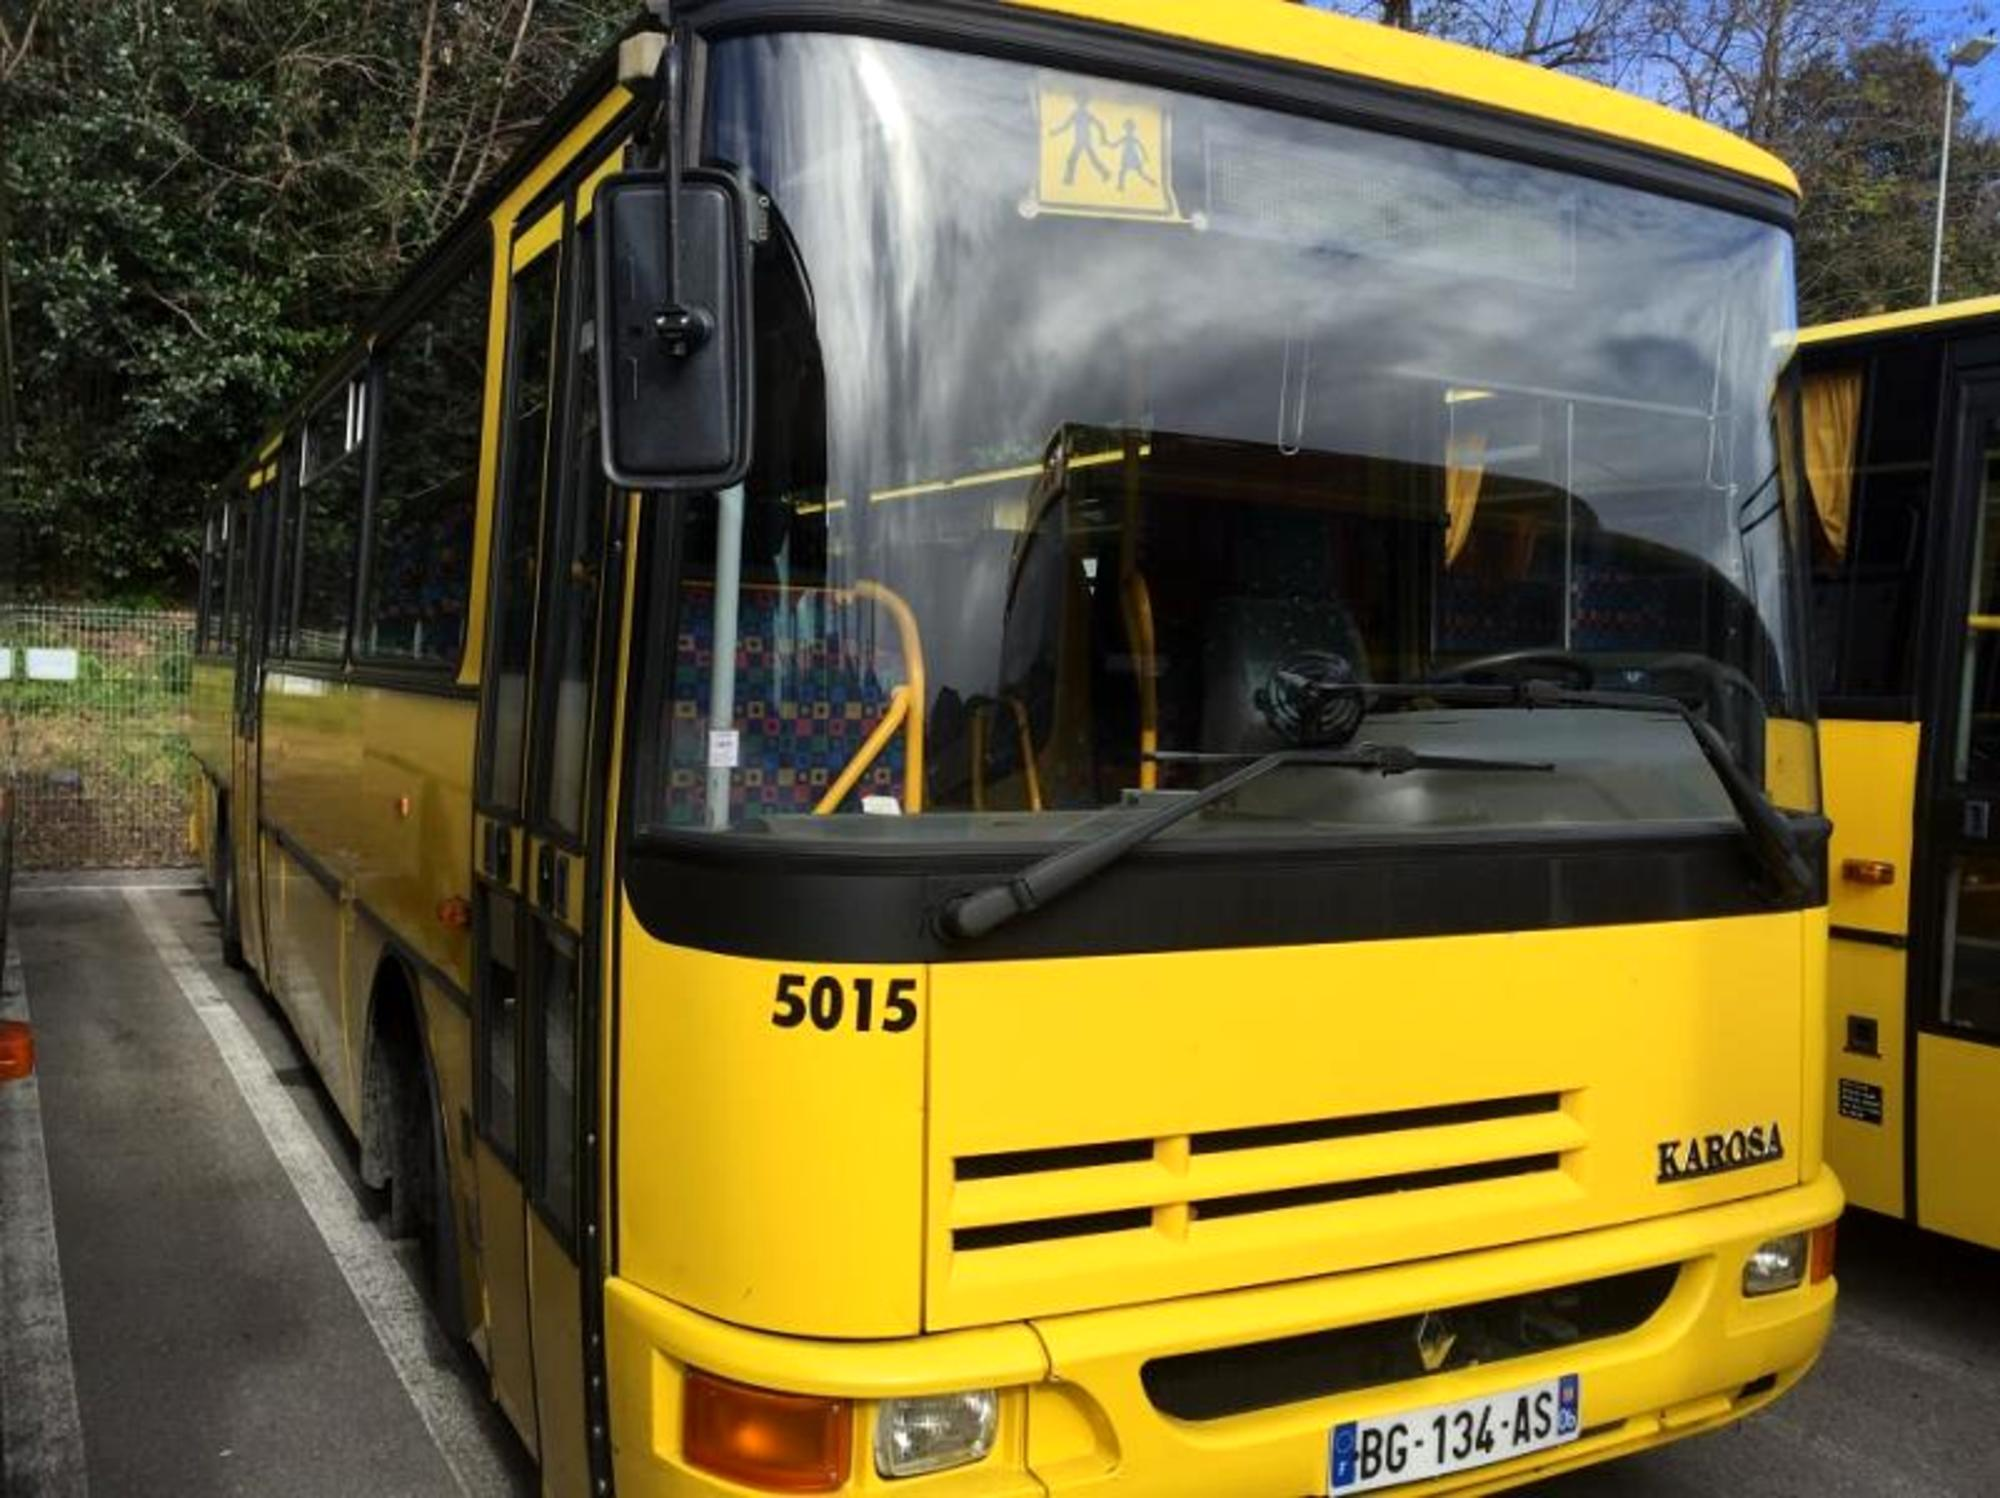 autocar karosa equivalent recreo 18919 5015 car bus d 39 occasion aux ench res agorastore. Black Bedroom Furniture Sets. Home Design Ideas